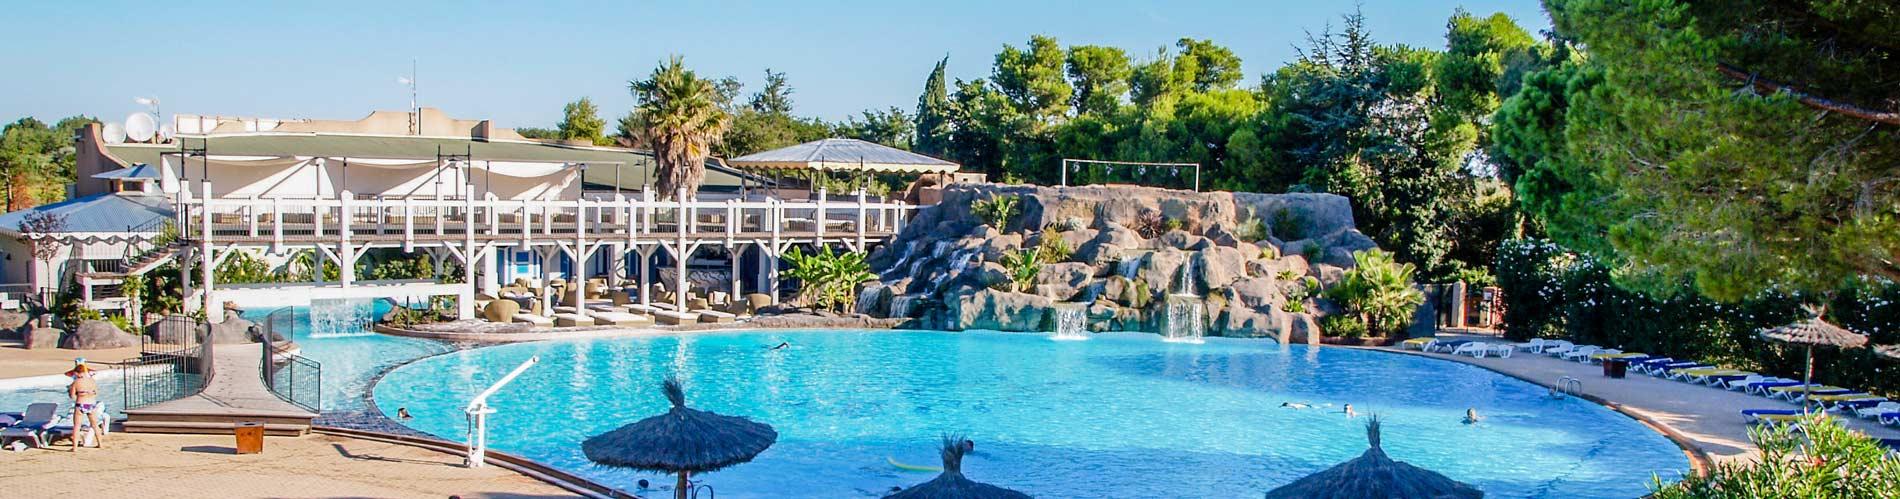 Campings argeles sur mer avec piscine parc aquatique for Camping 5 etoiles var bord de mer avec piscine